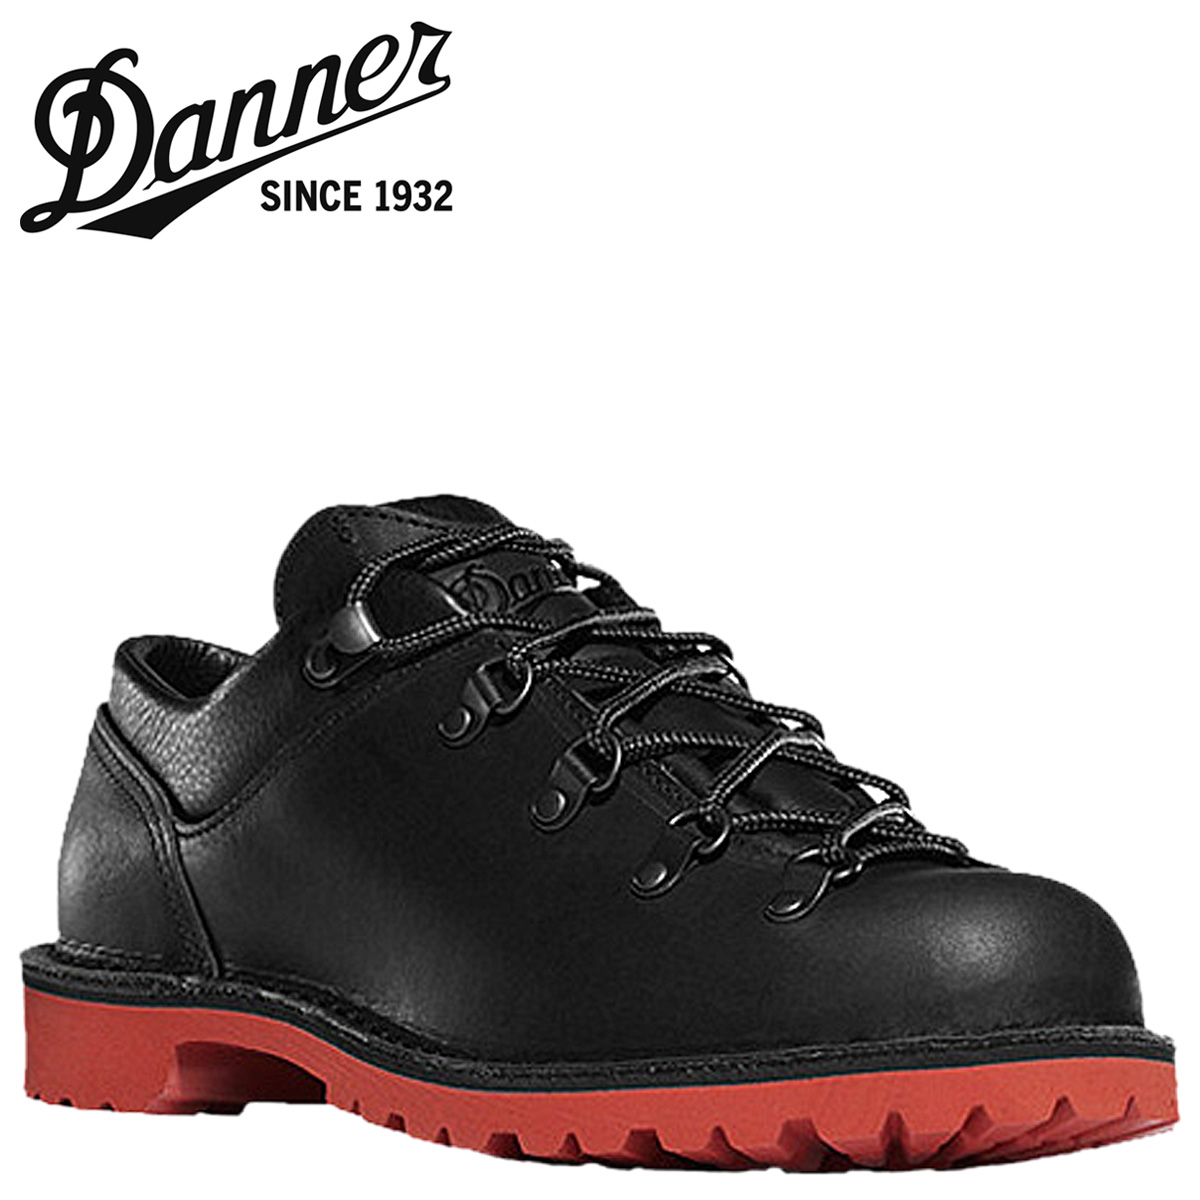 [SOLD OUT]Danner Danner地道超过外观黑色33401 Underpass Overlook EE怀斯皮革Made in USA鞋人